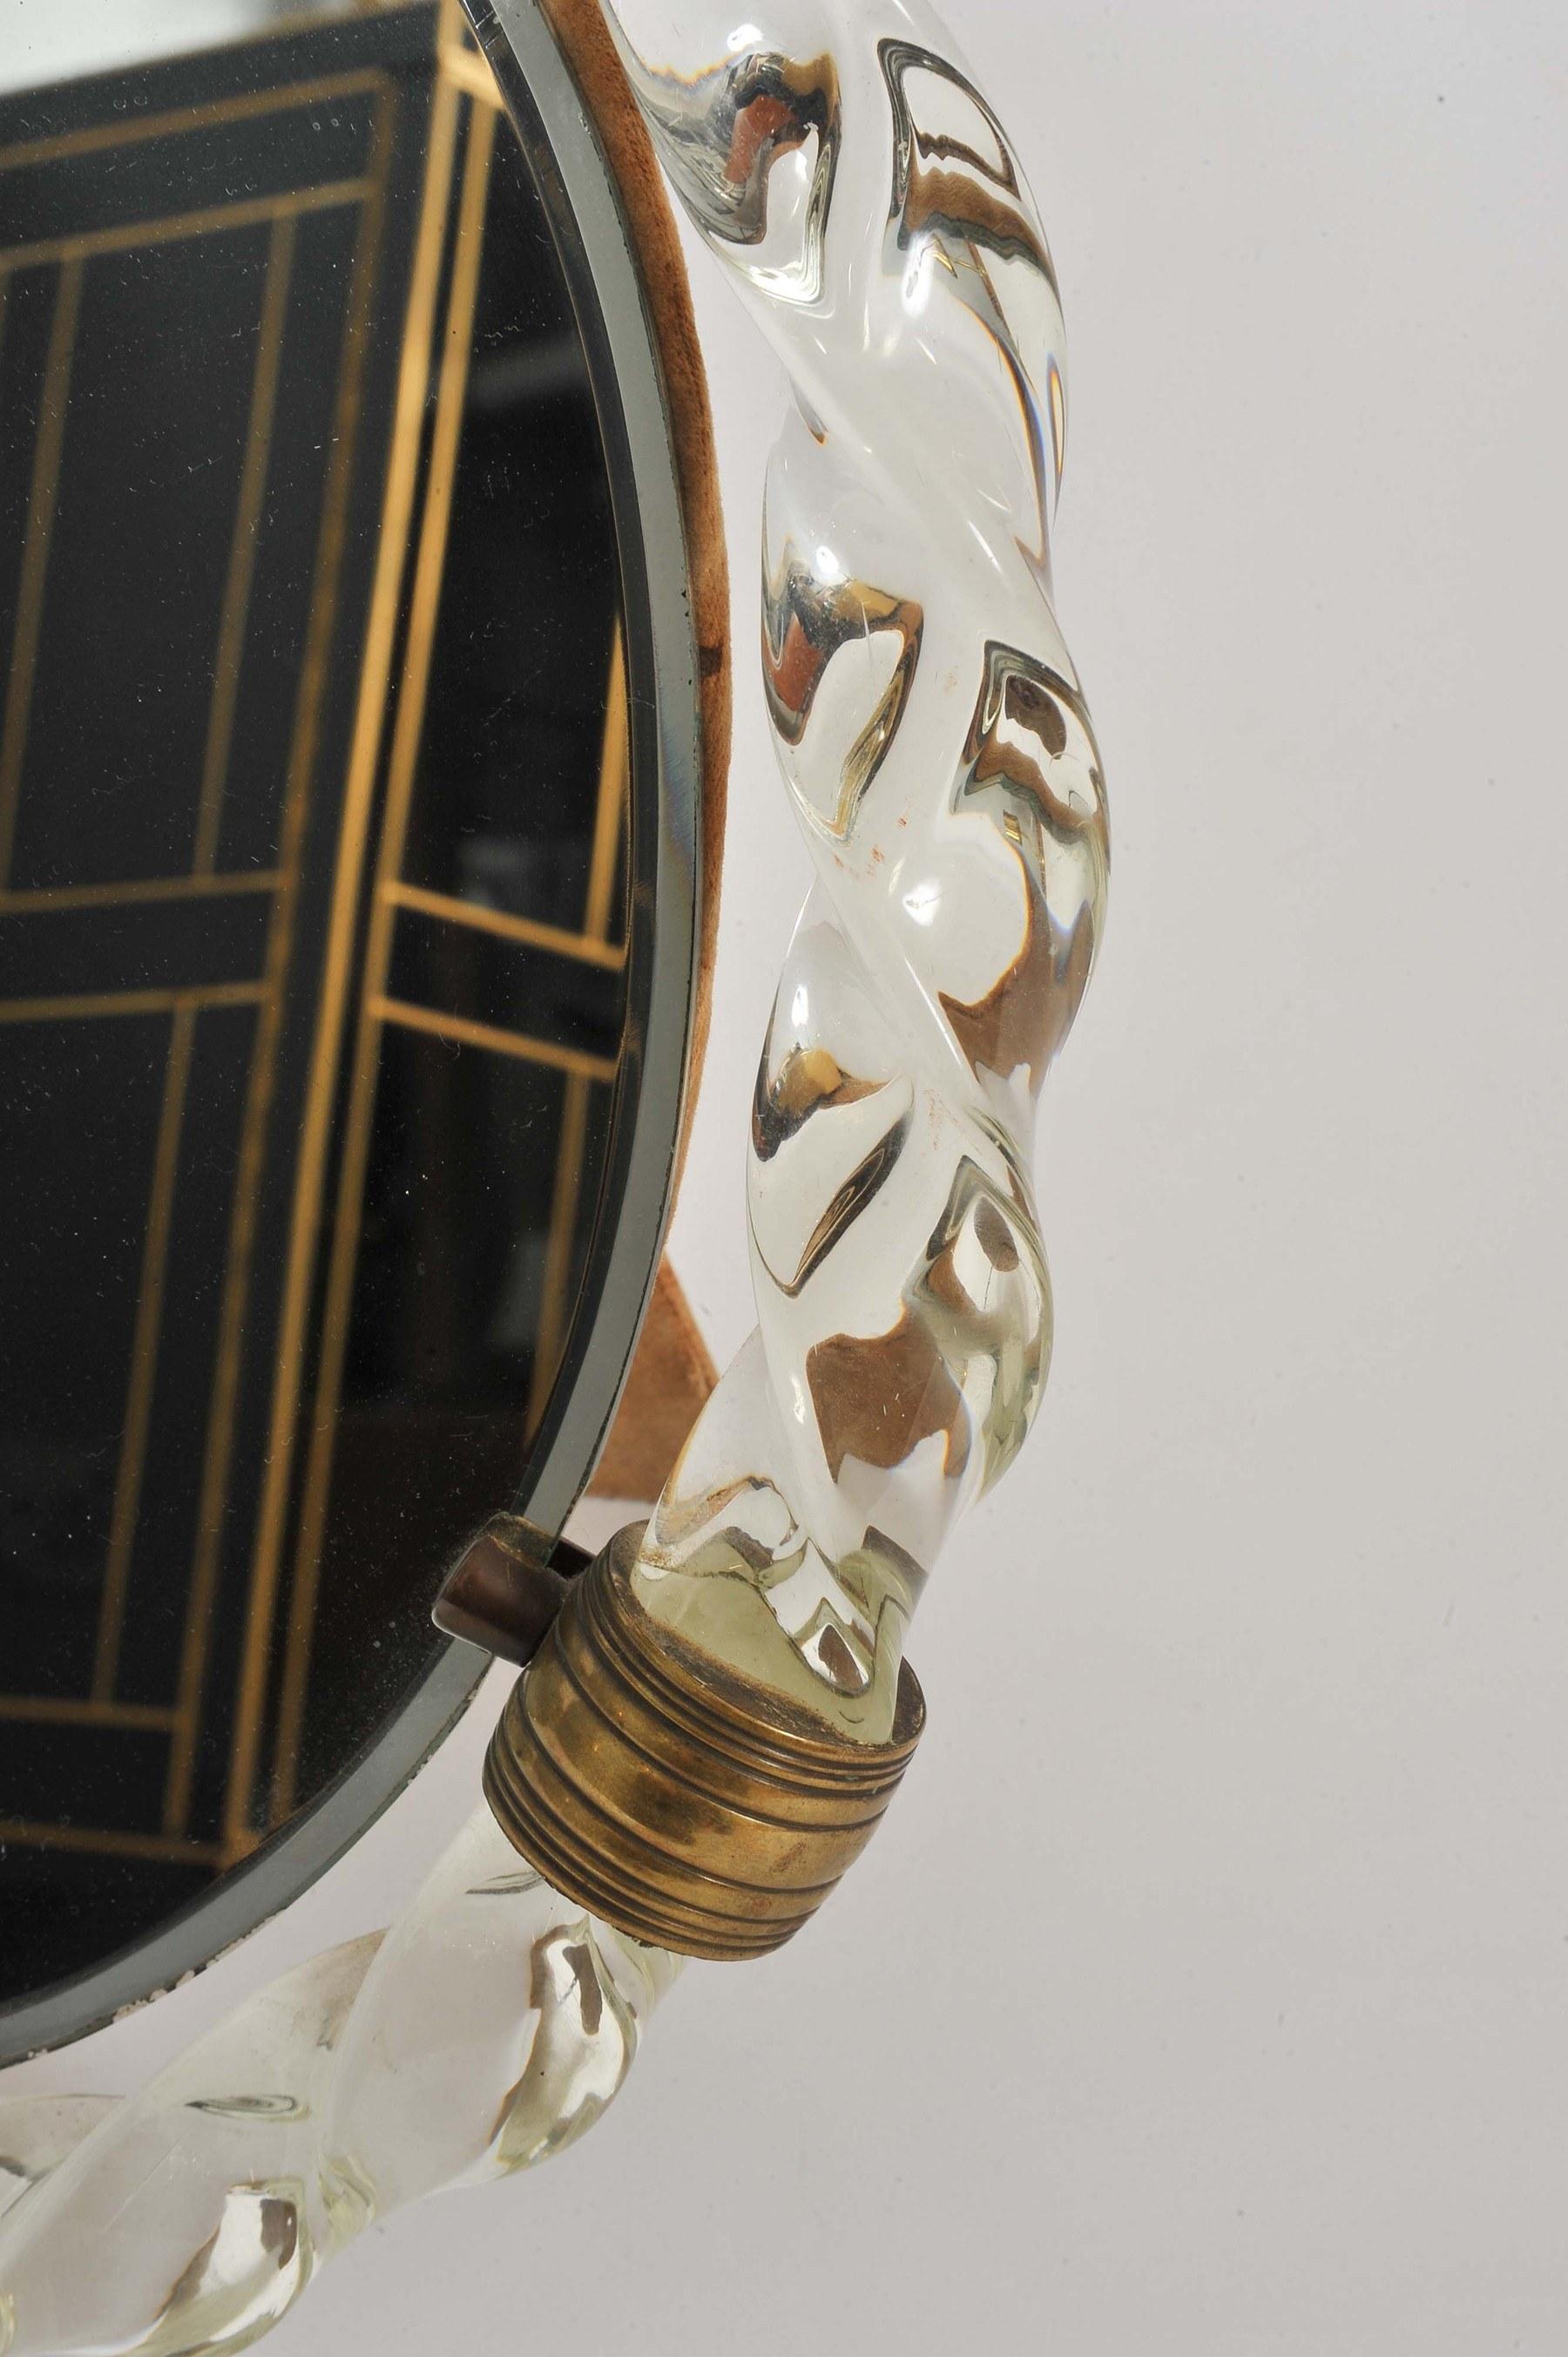 Valerie Wade Mt669 1950S Italian Oval Dressing Table Mirror 06